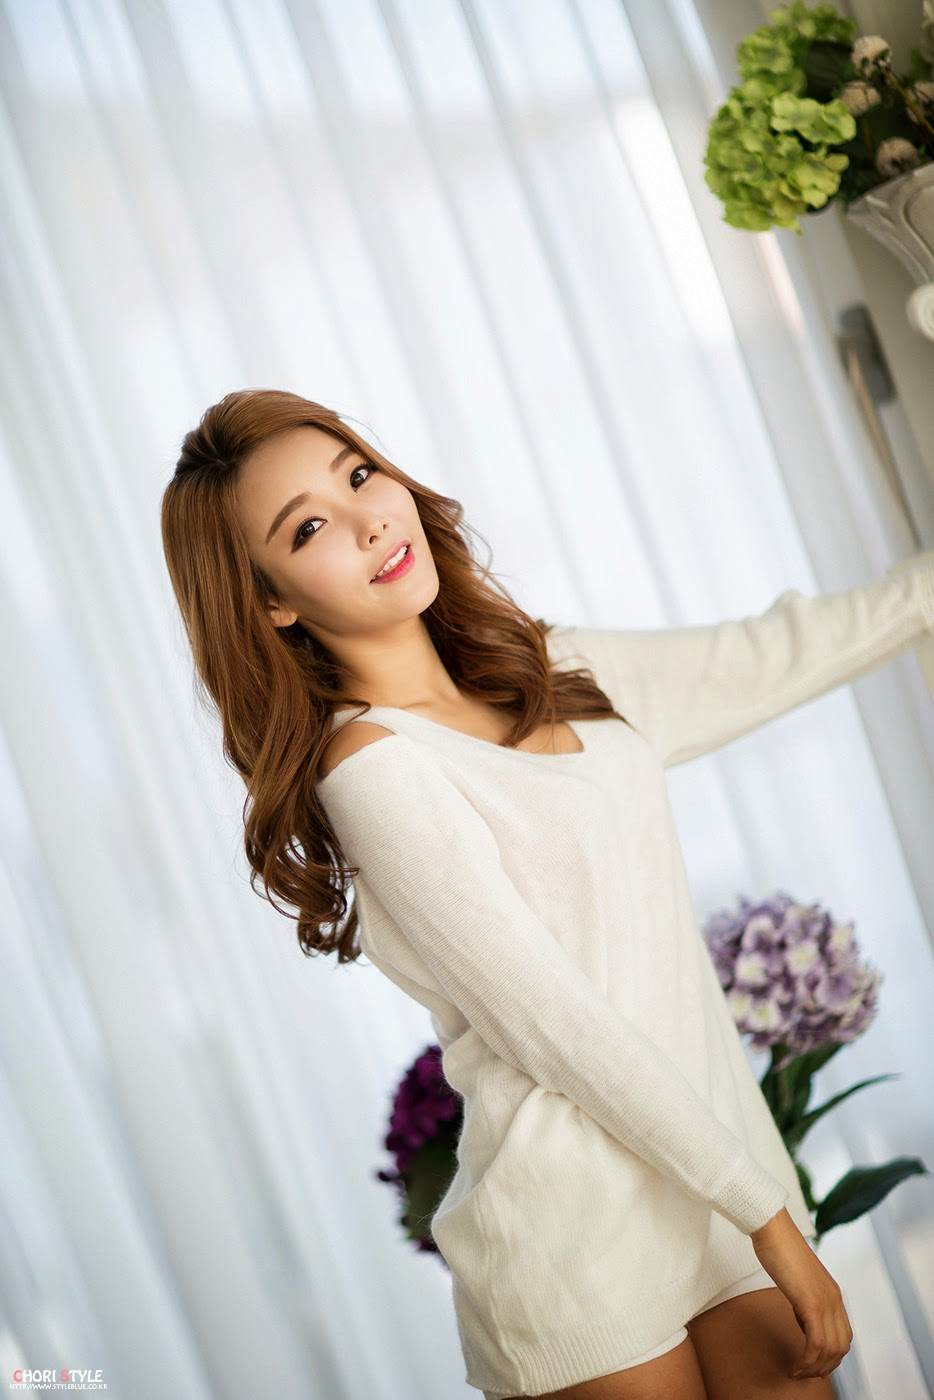 3 Lee Da Hee - Morning - very cute asian girl-girlcute4u.blogspot.com